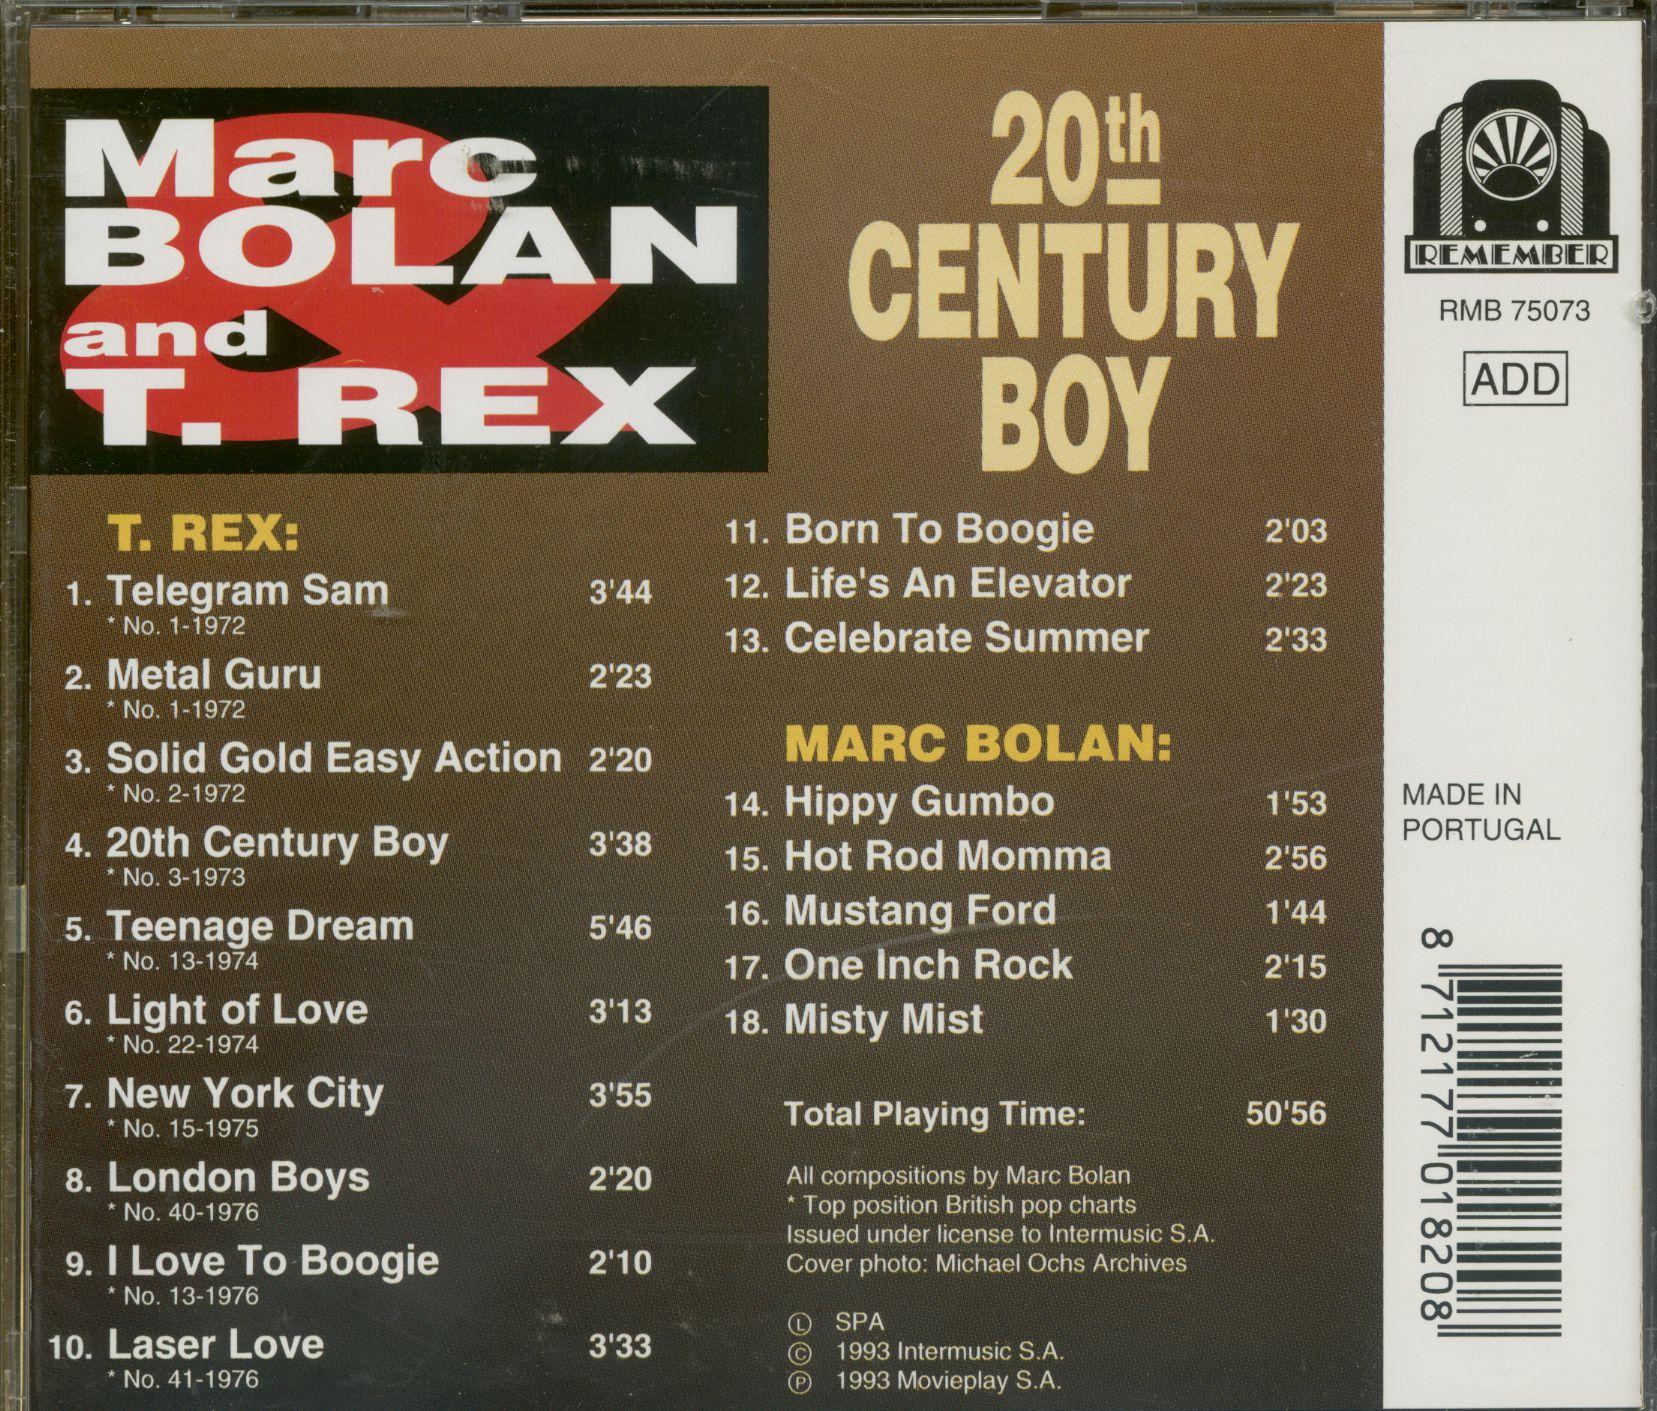 Marc Bolan & T.Rex CD: 20th Century Boy (CD)